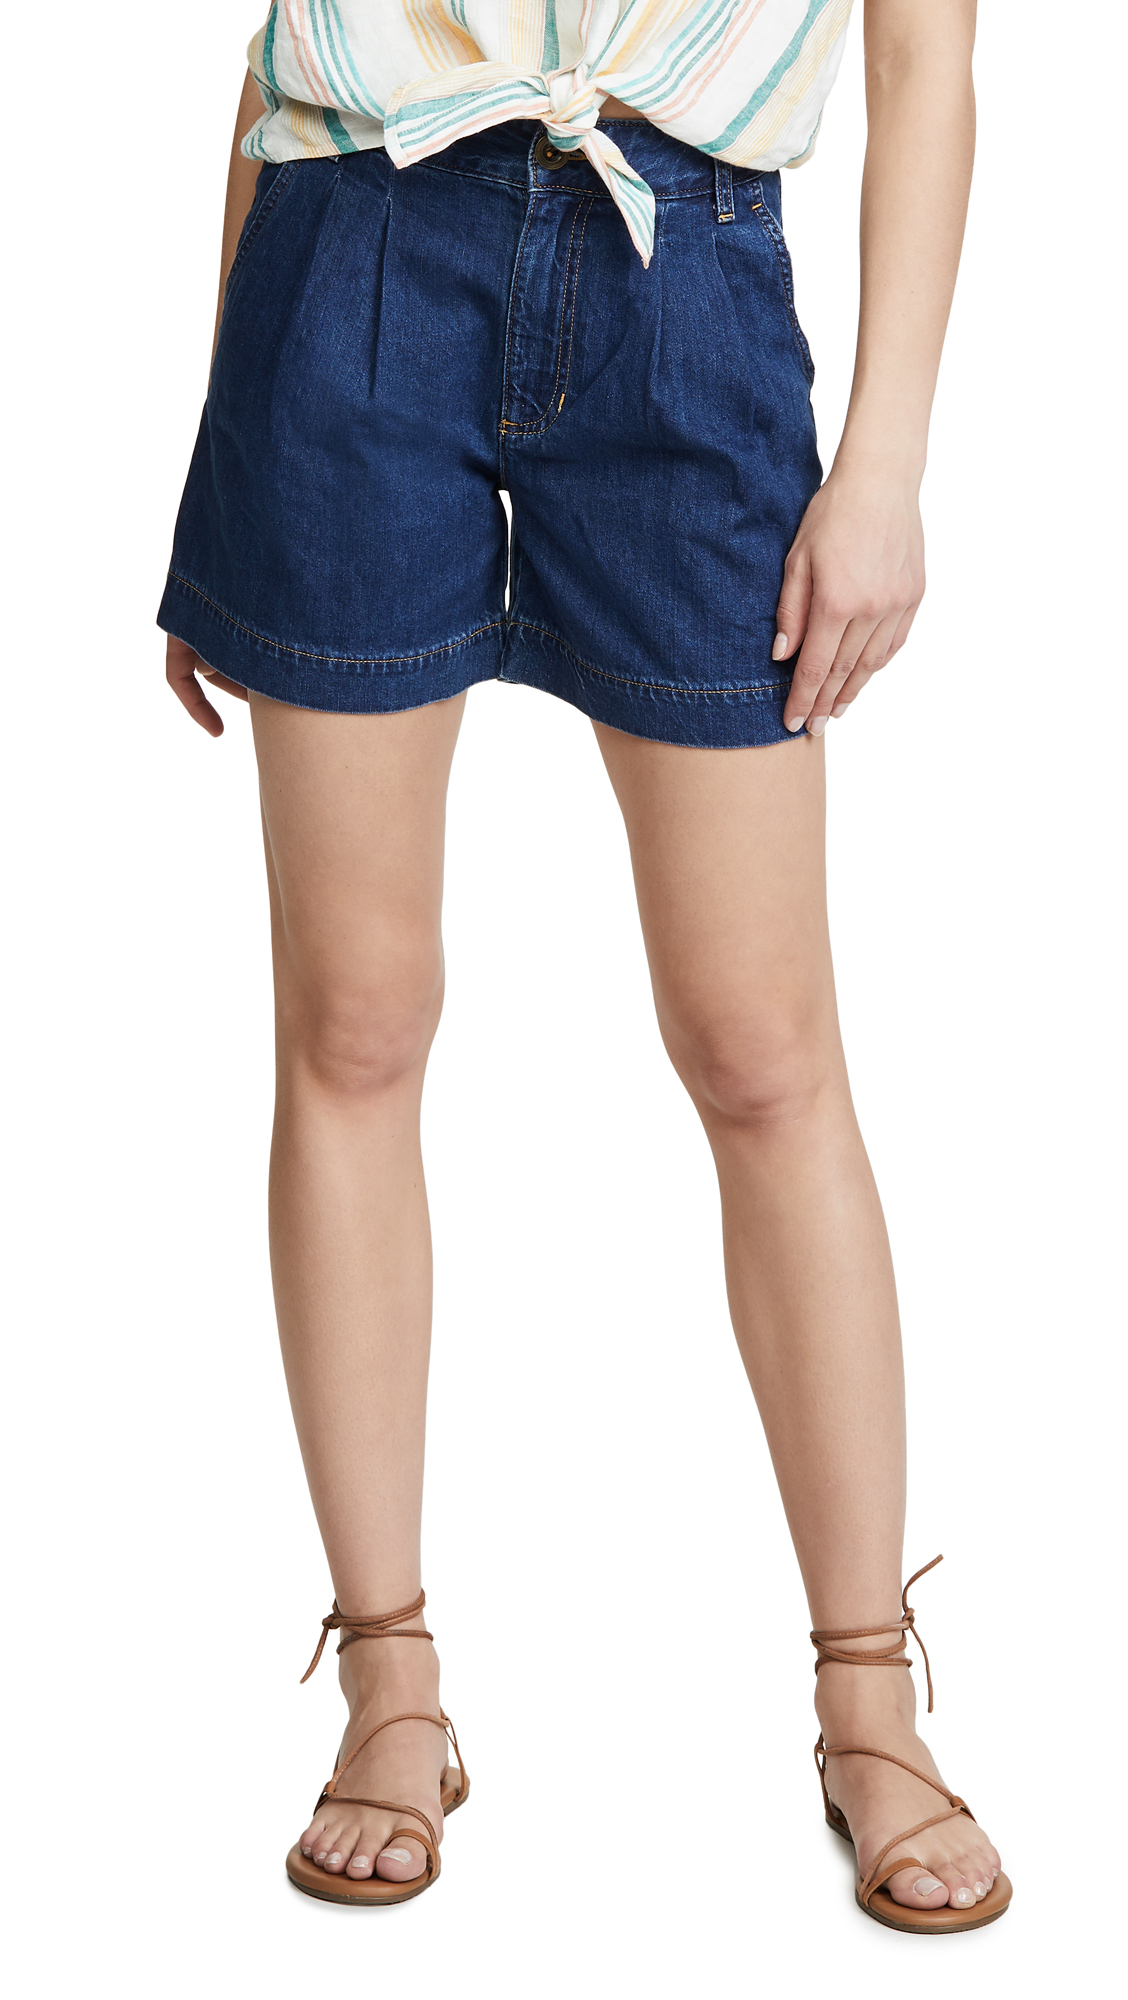 Lee Vintage Modern Pleated Shorts - Artisan Blue